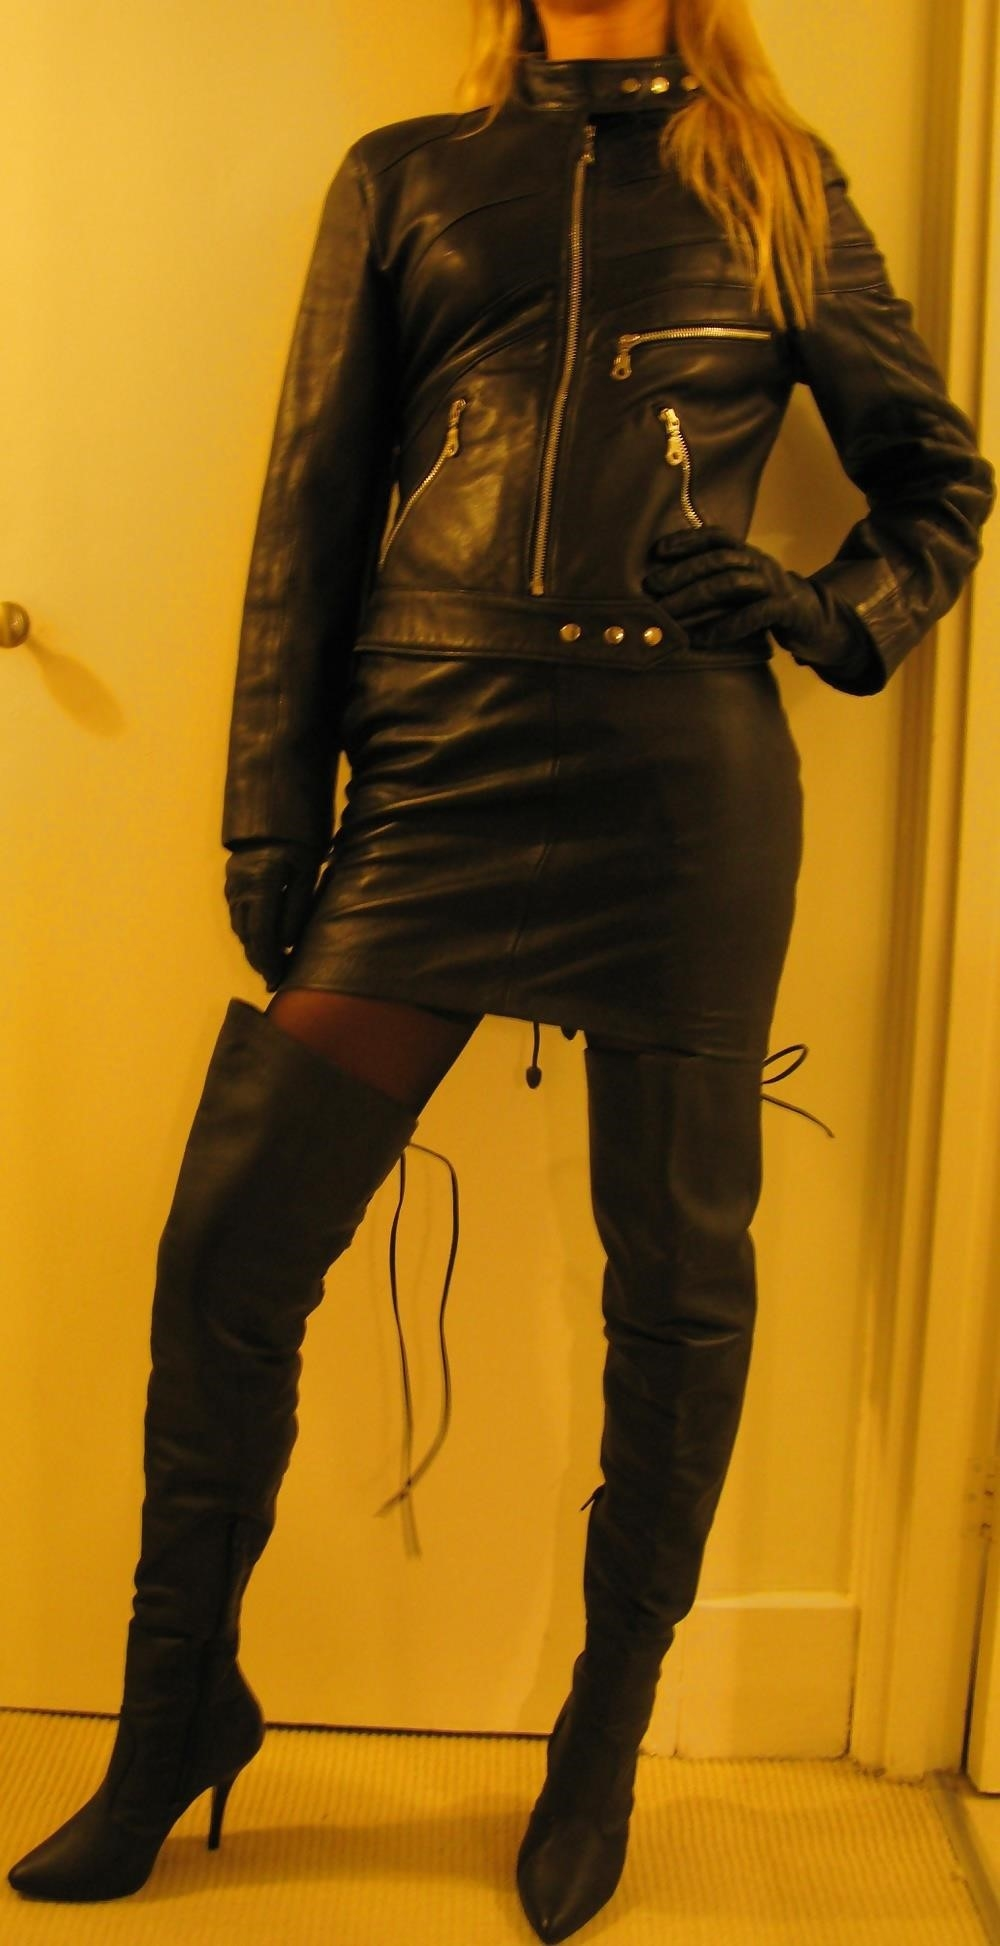 Leather girl bdsm-2856